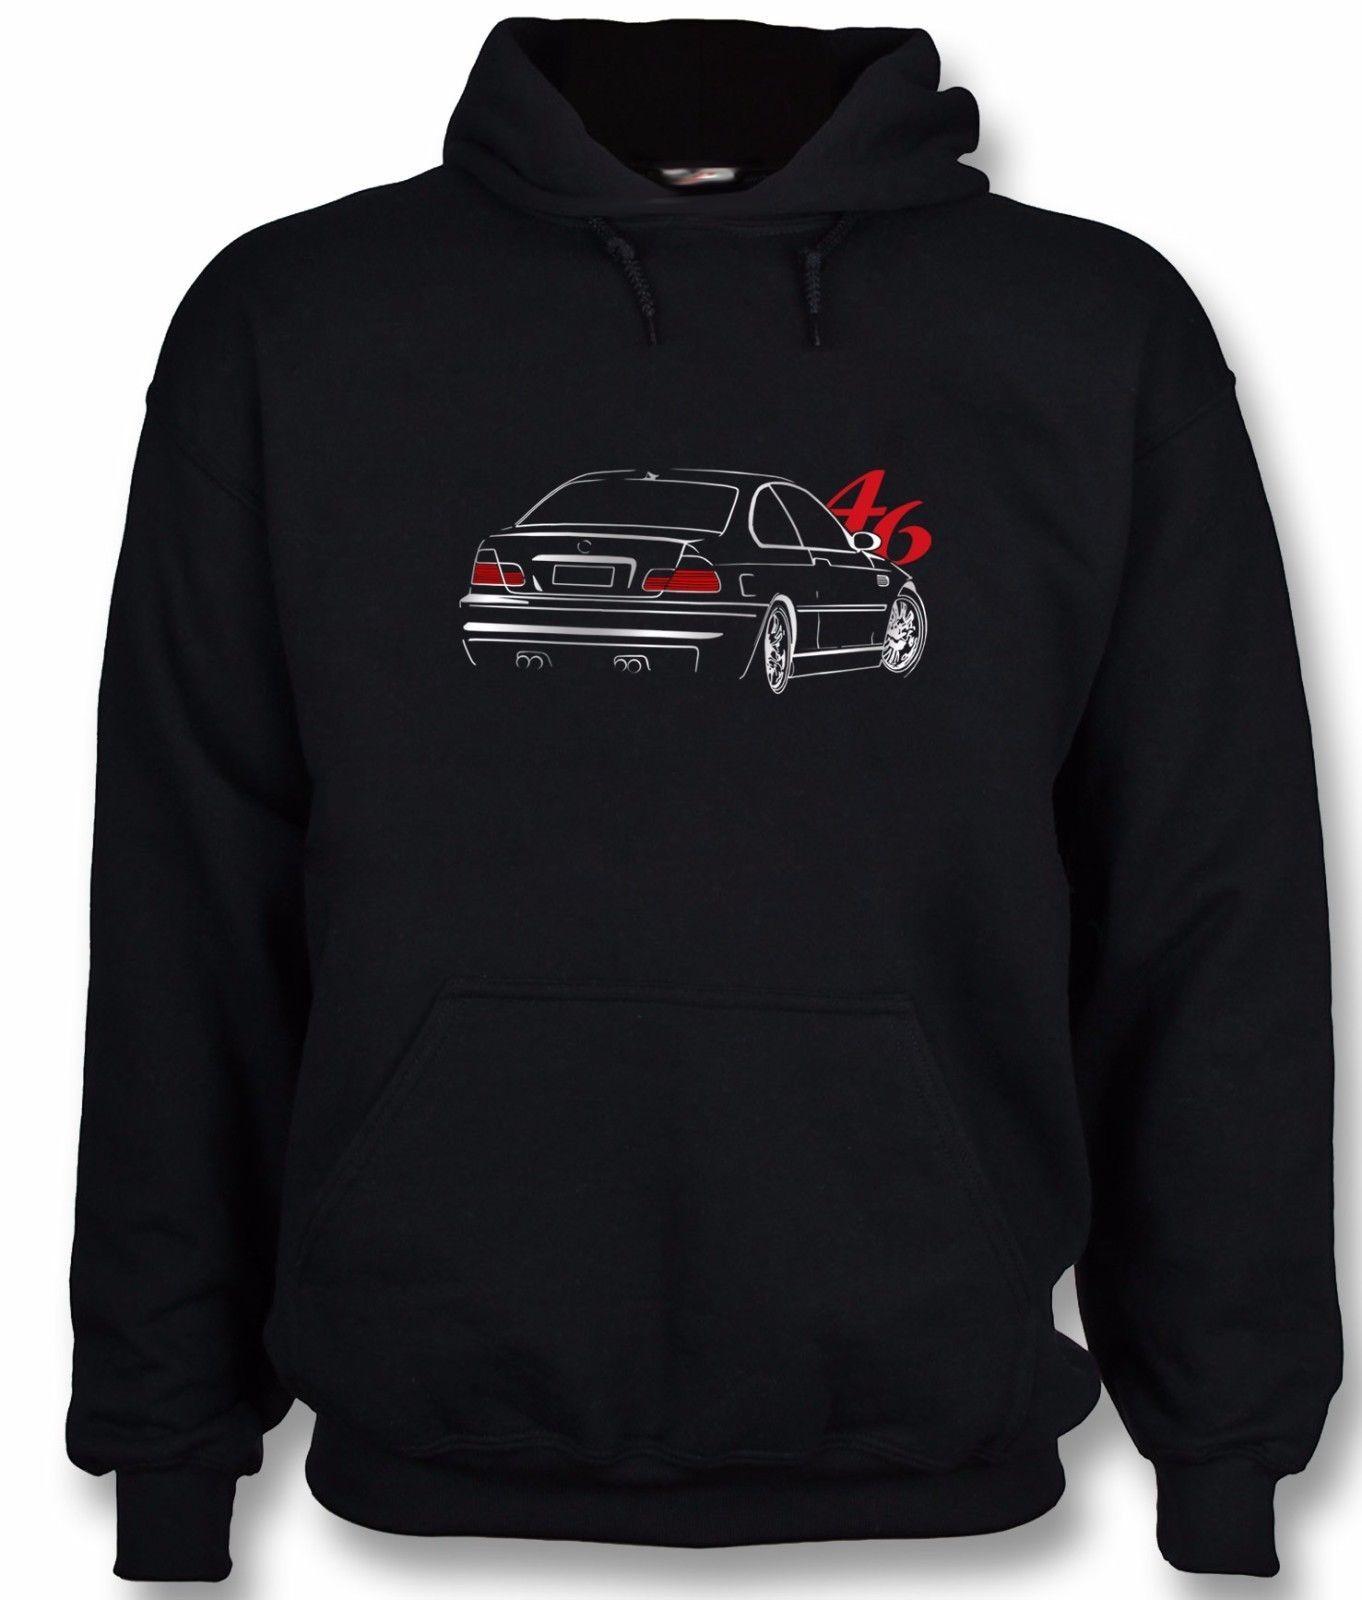 435d9182 T-shirt for bmw e46 fans m3 325 tshirt + hoodie | Graphic T shirts ...